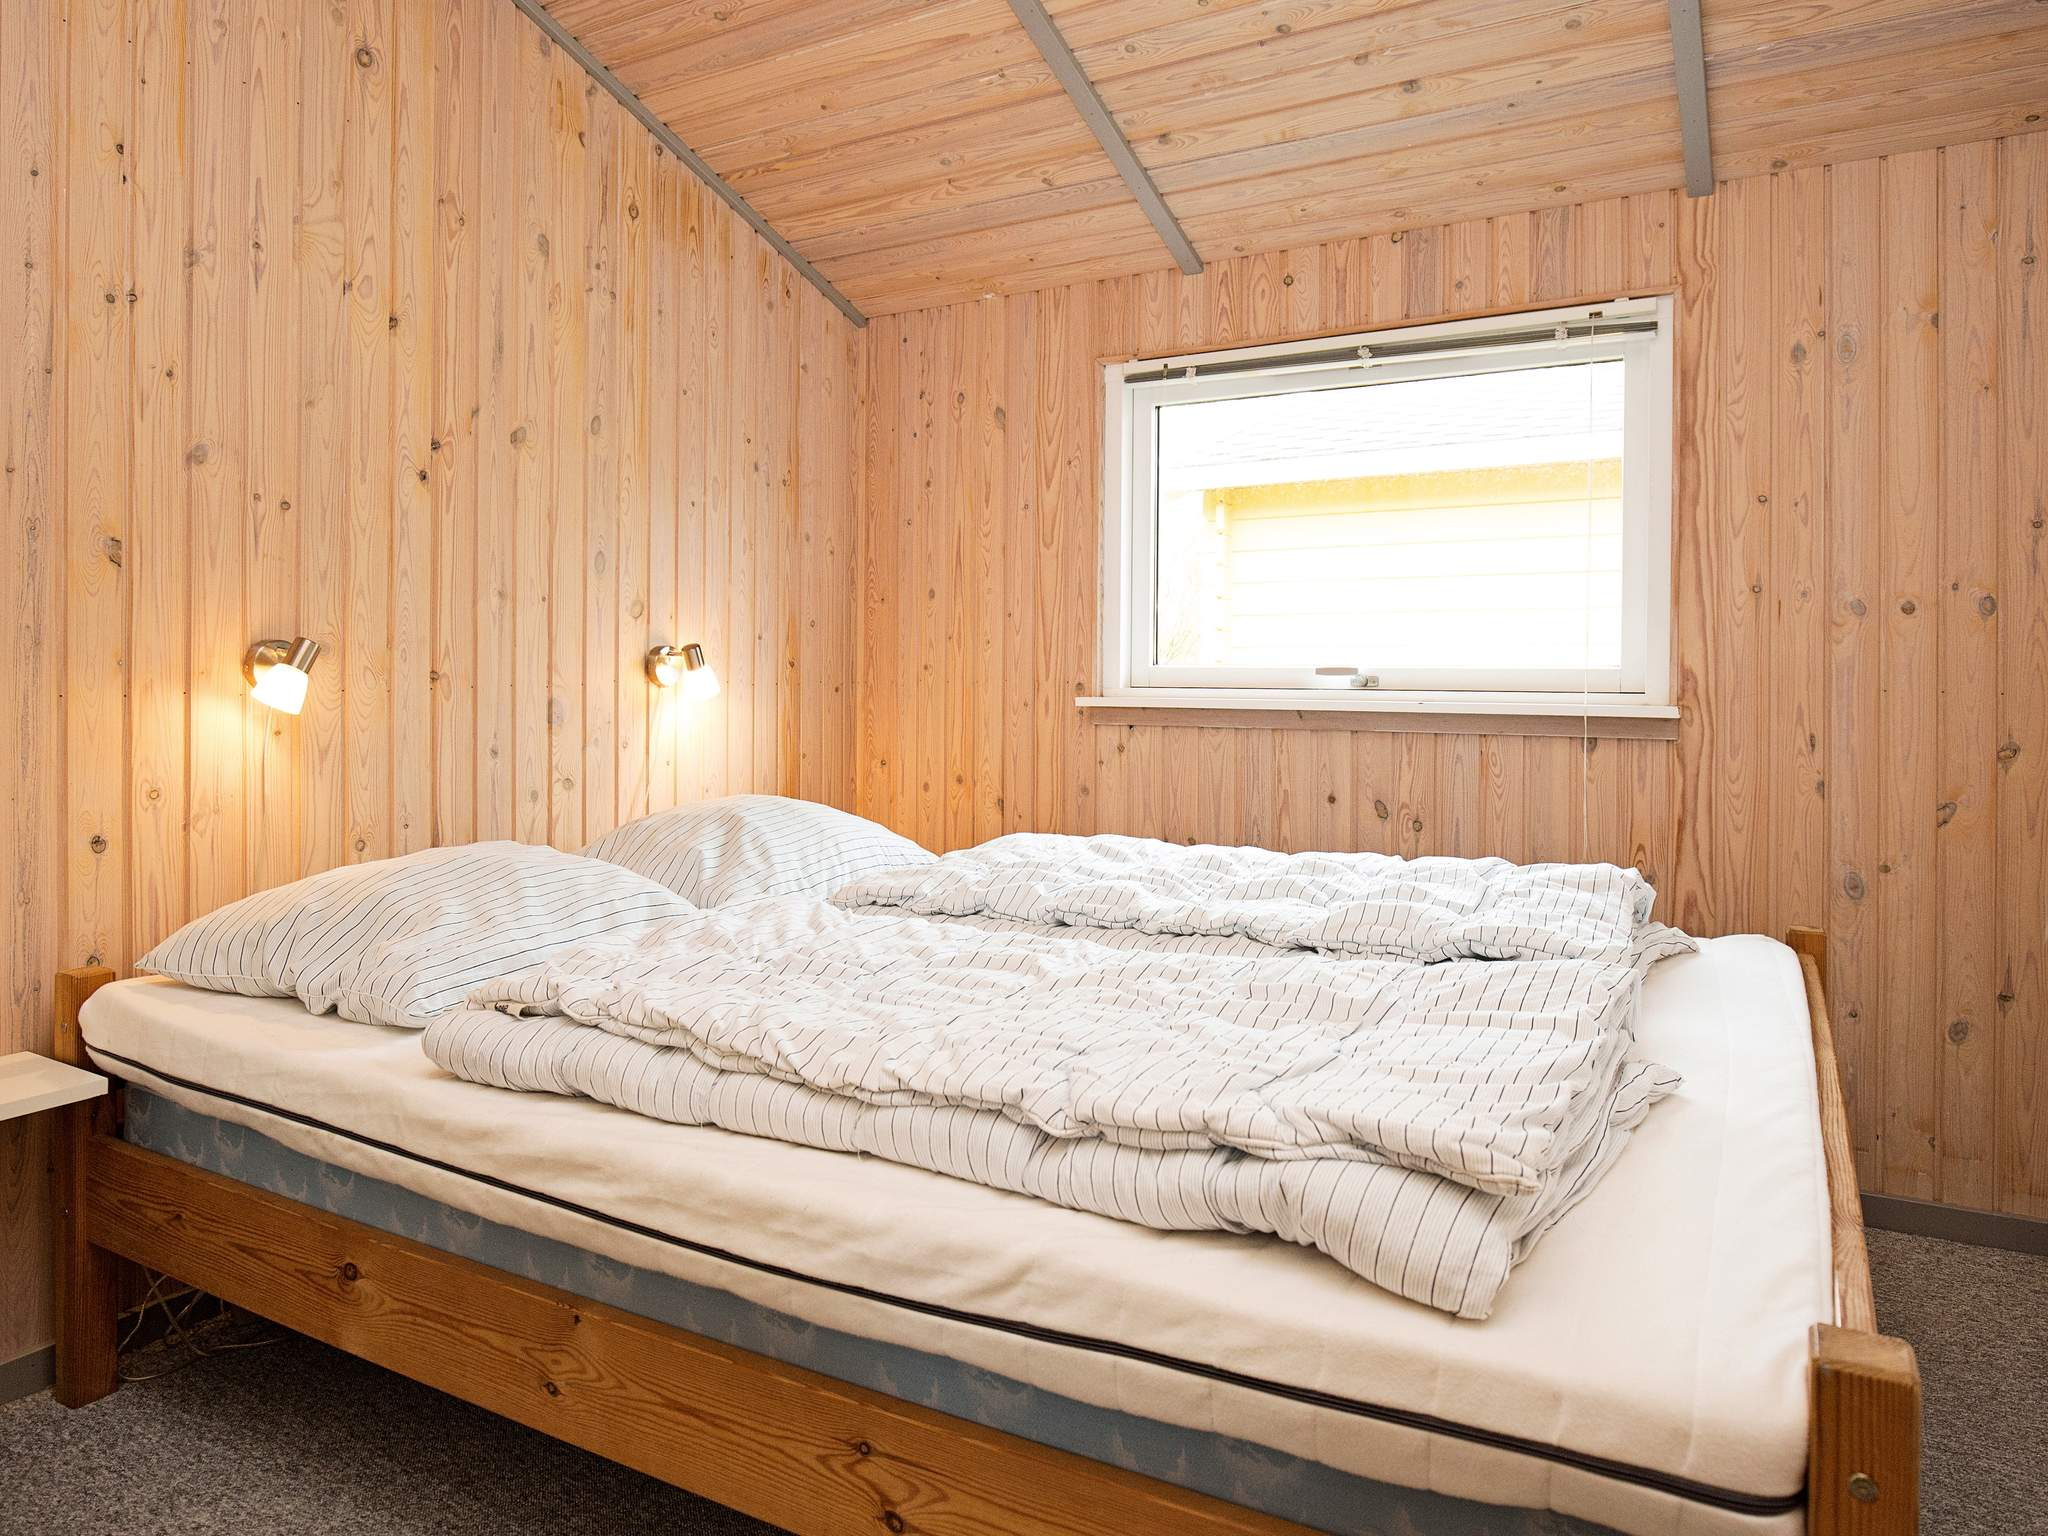 Ferienhaus Råbylille Strand (428716), Råbylille, , Møn, Dänemark, Bild 7